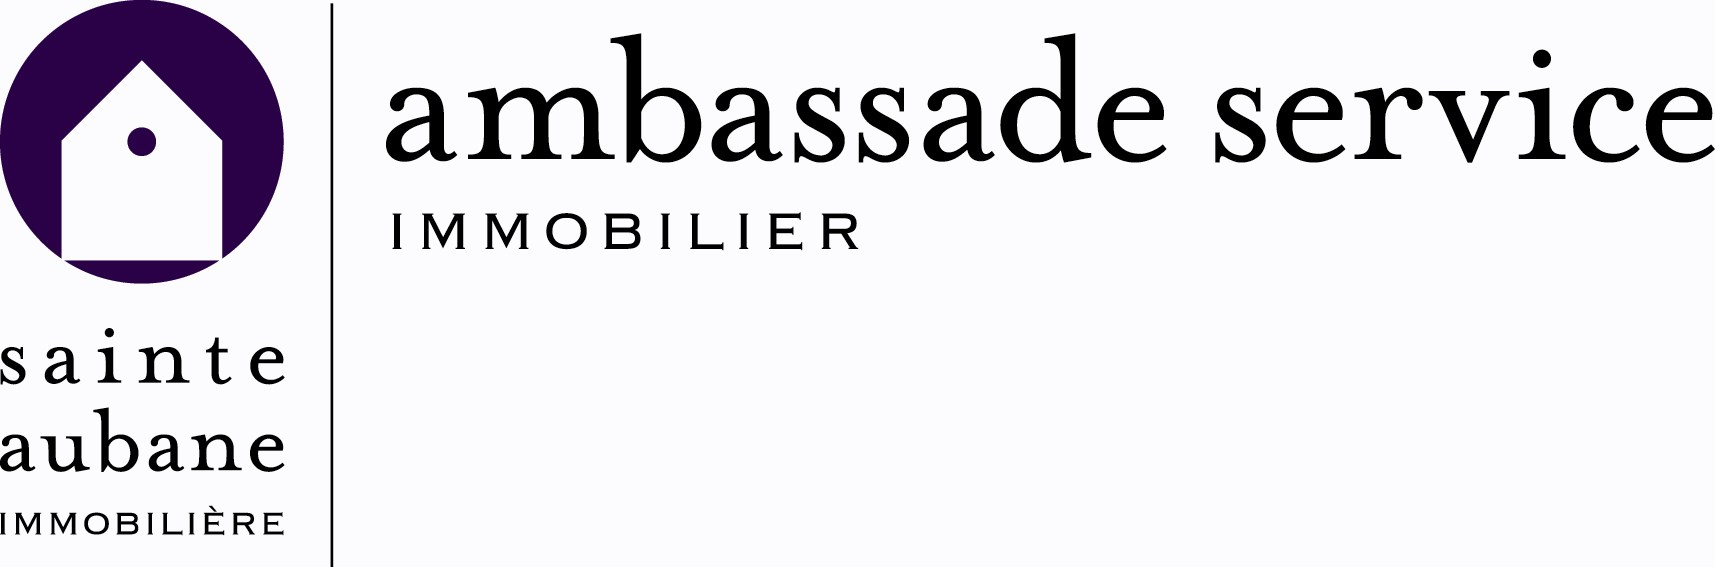 AMBASSADE SERVICE IMMOBILIER